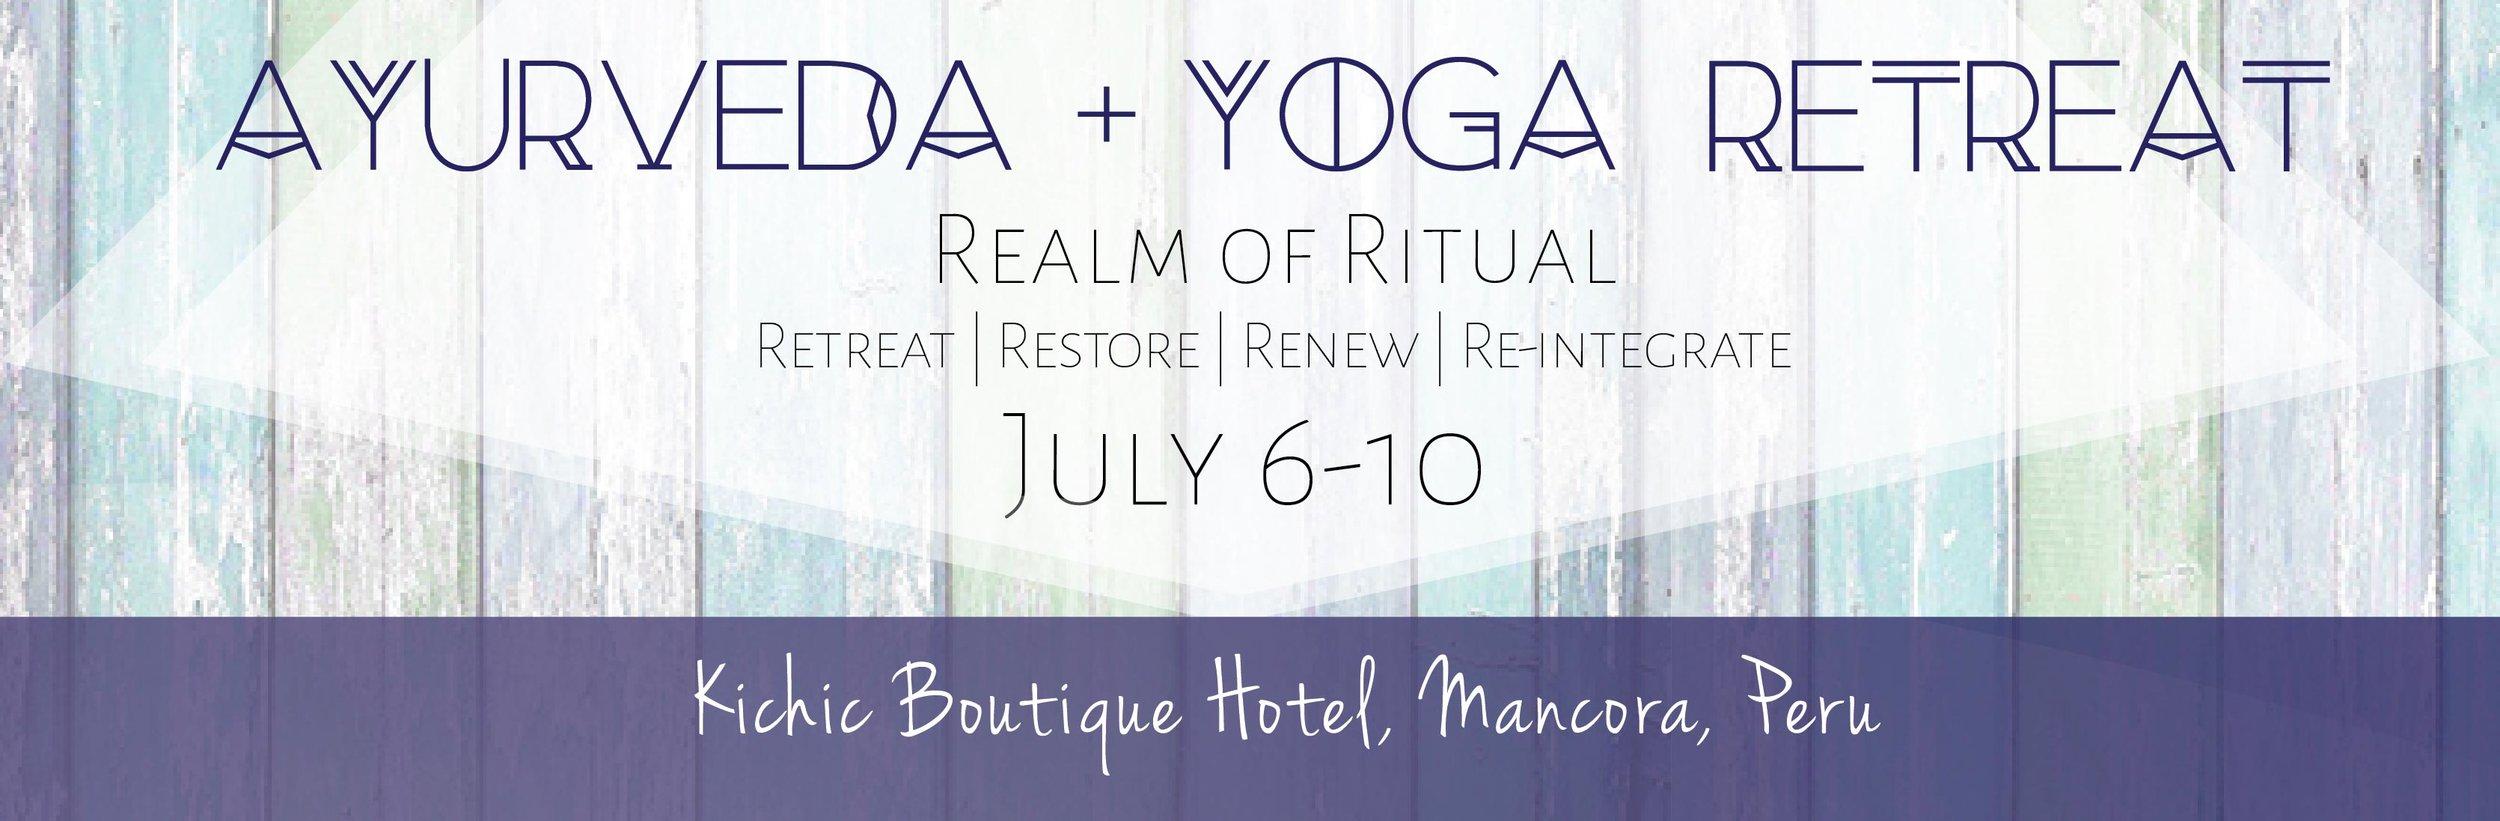 Kichic_2018_ayurveda_yoga_retreat_manora_kichic_peru.jpg